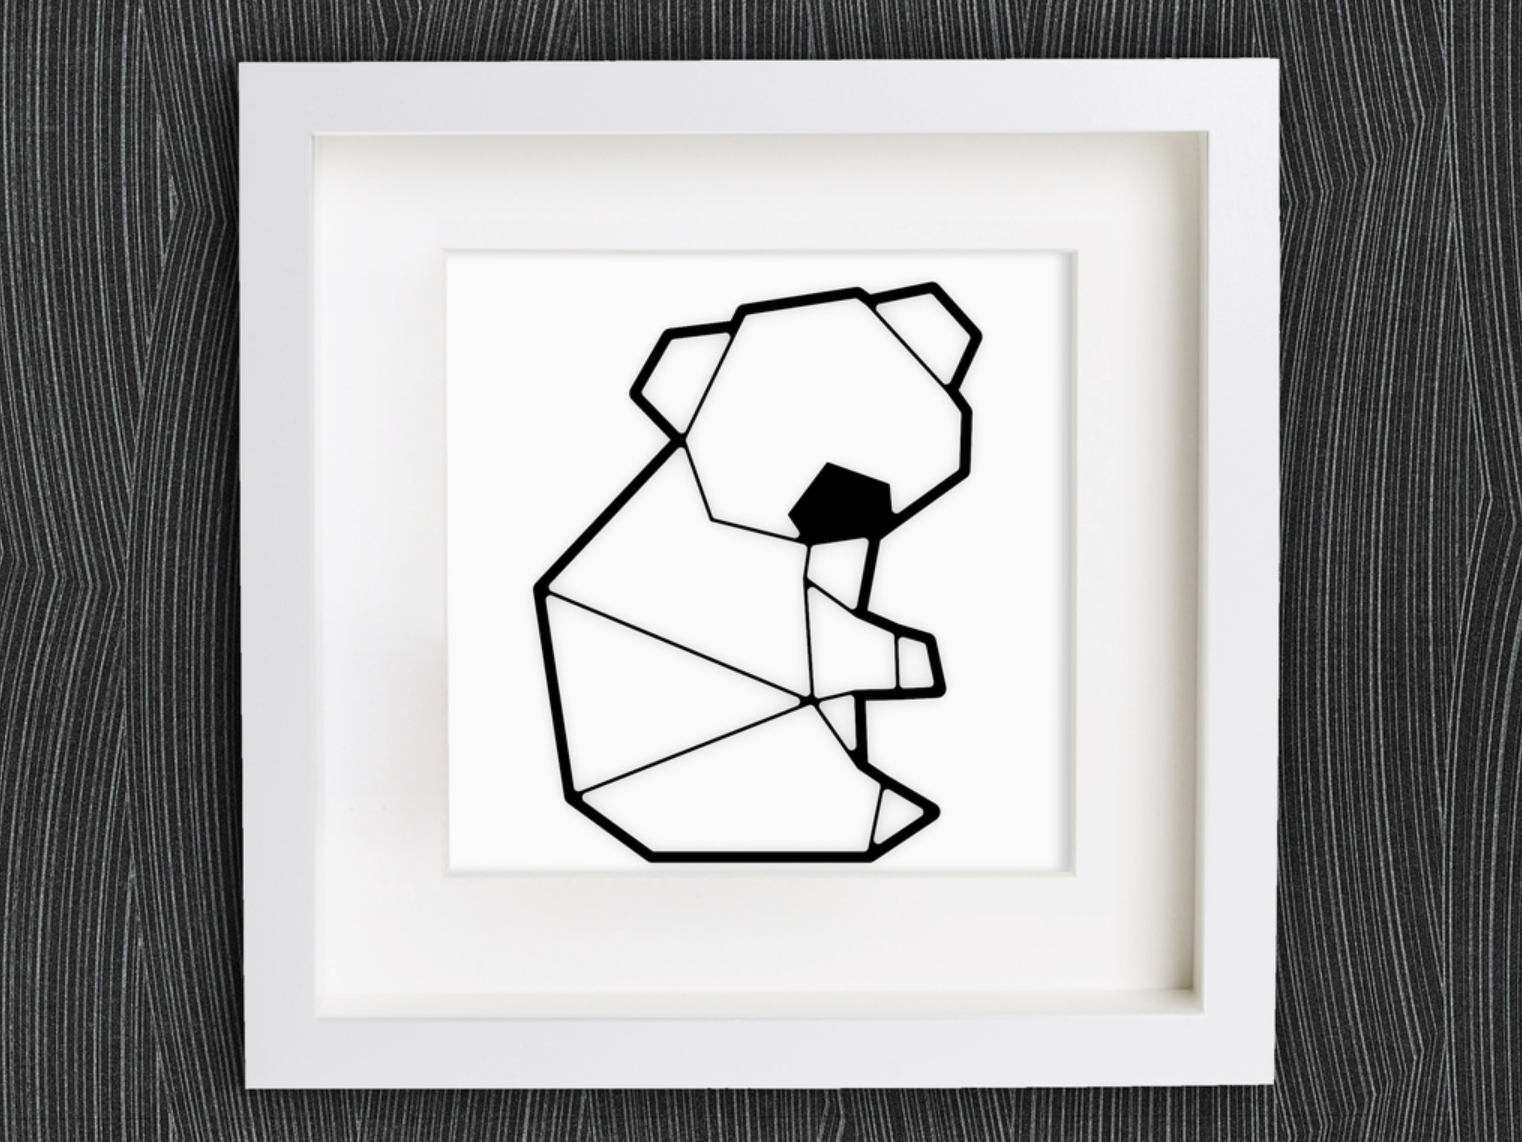 Modelo STL Personalizable Origami Cute Koala gratis ・ Cults